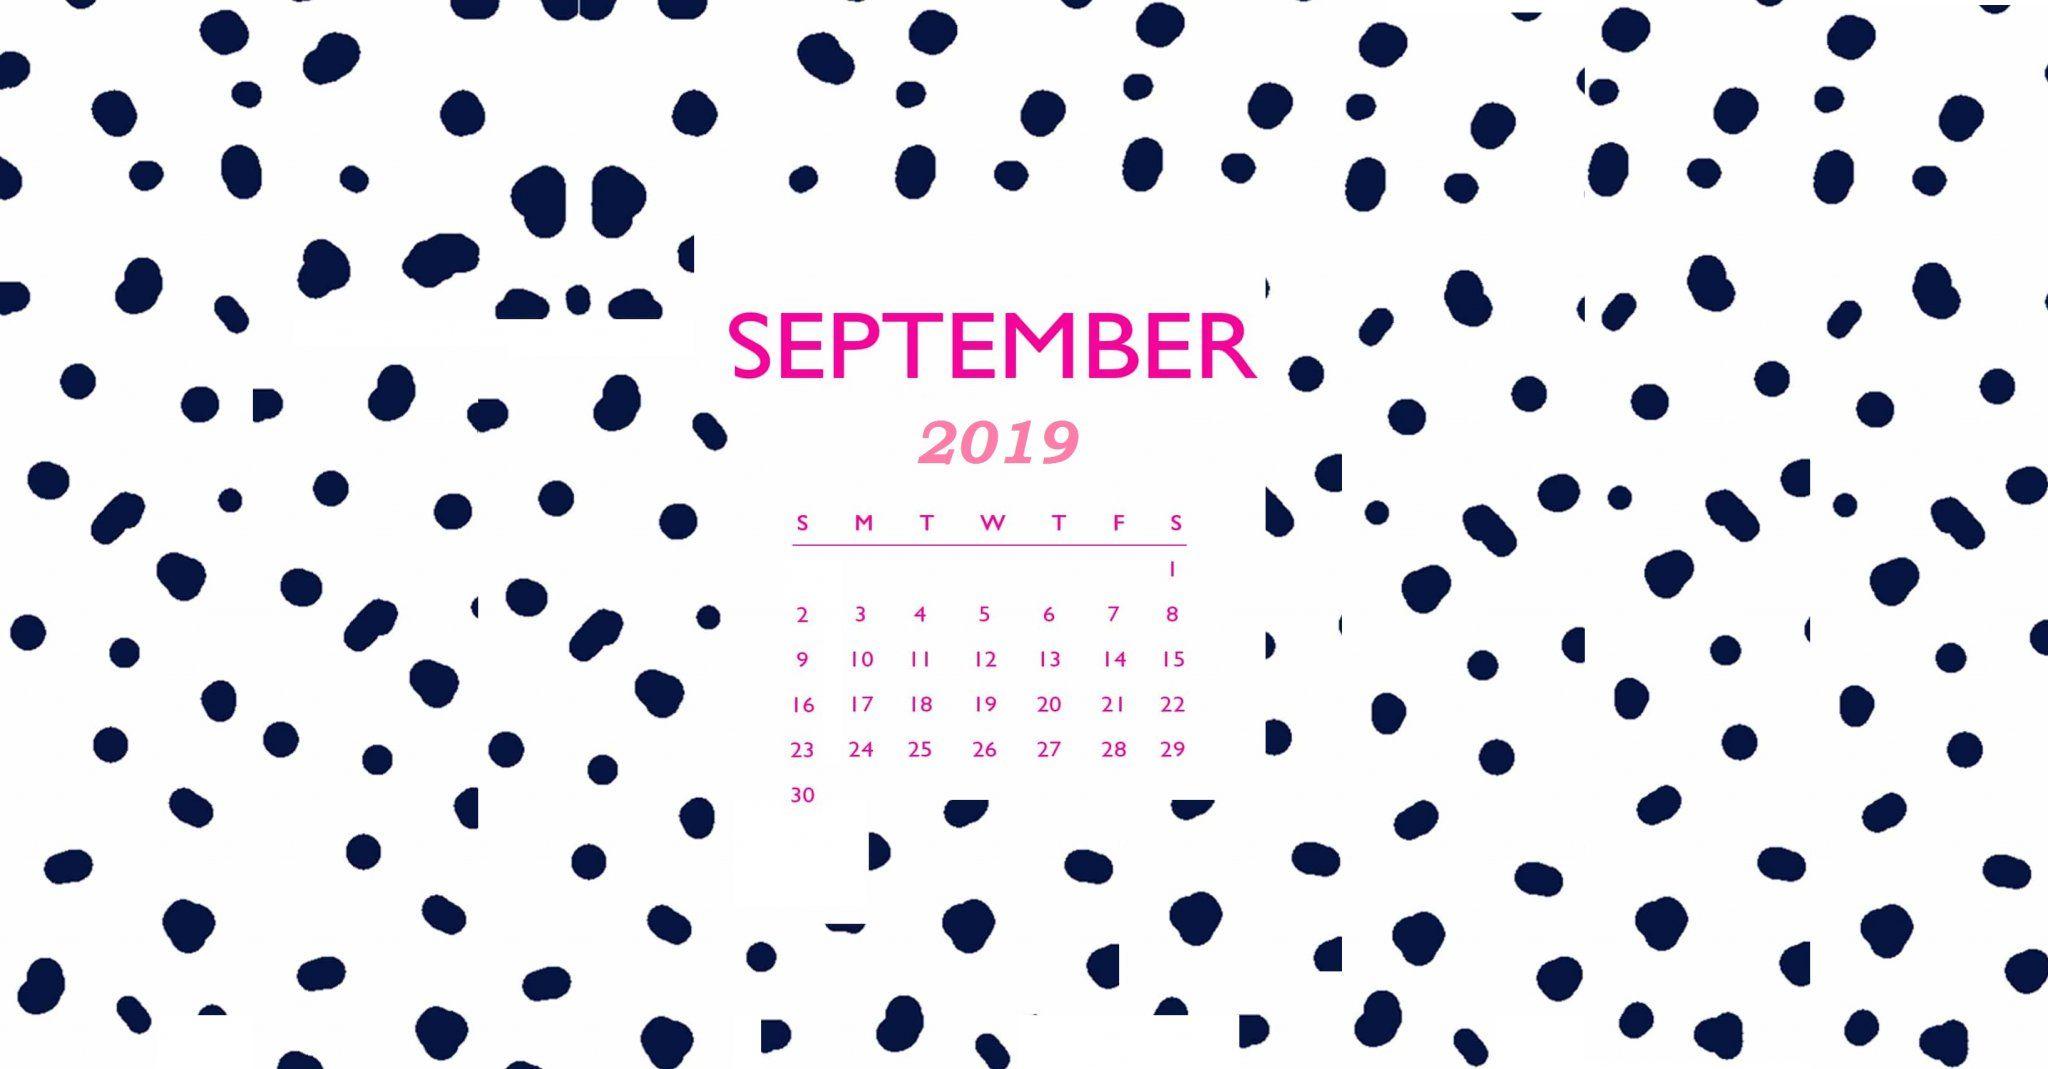 September 2019 Calendar Wallpaper